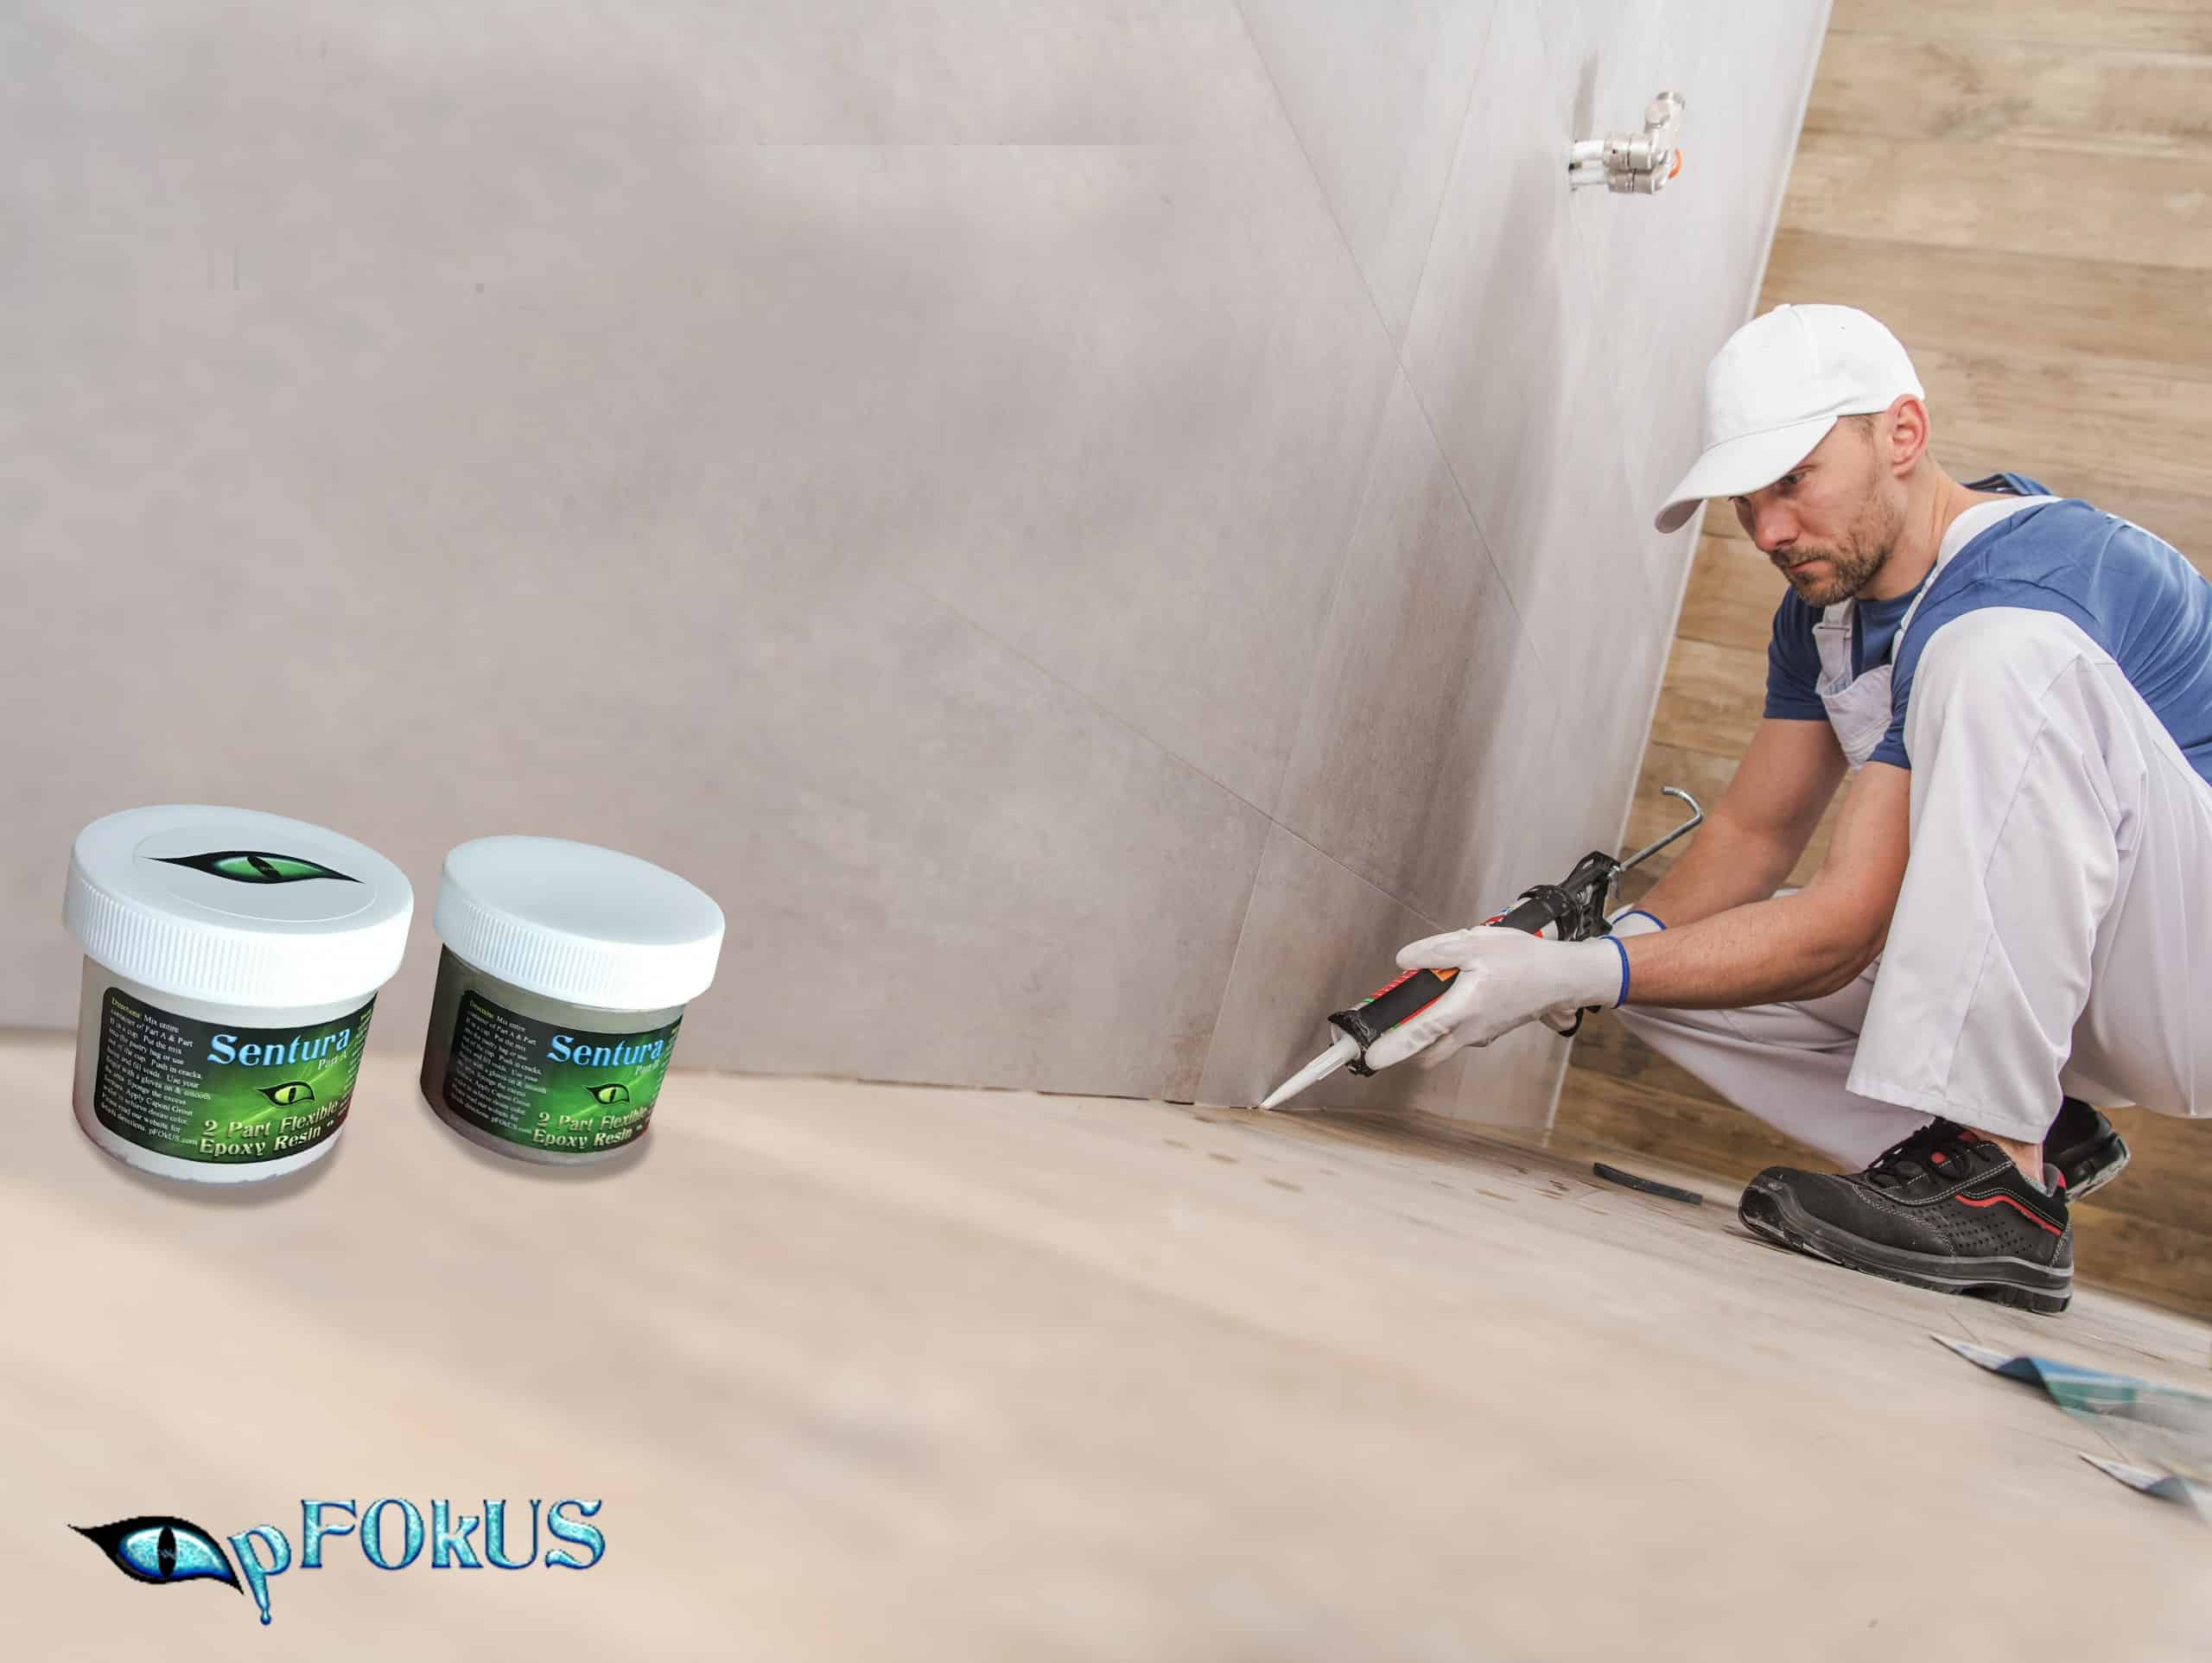 Caulk Substitute for Sealing Shower Corners - Sentura